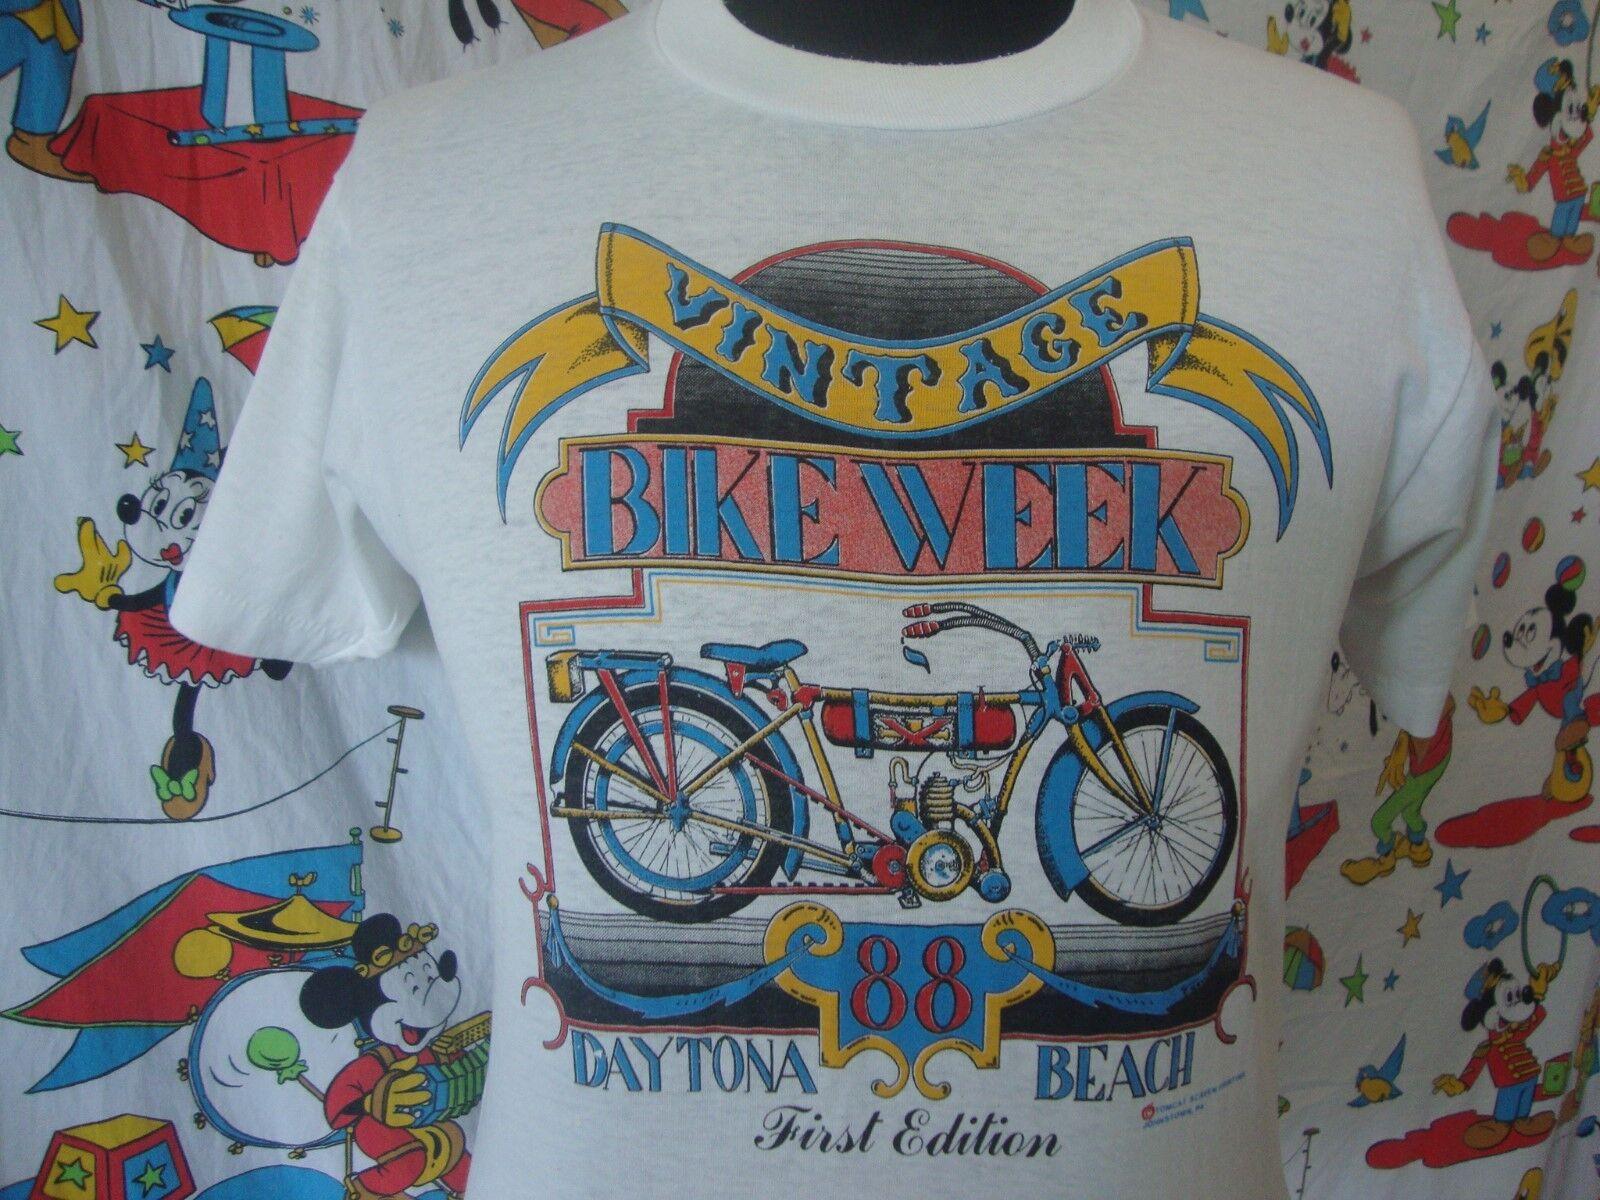 1988 Vintage Daytona Beach Bike Week Motorcycle MC Cycle Biker thin T Shirt L